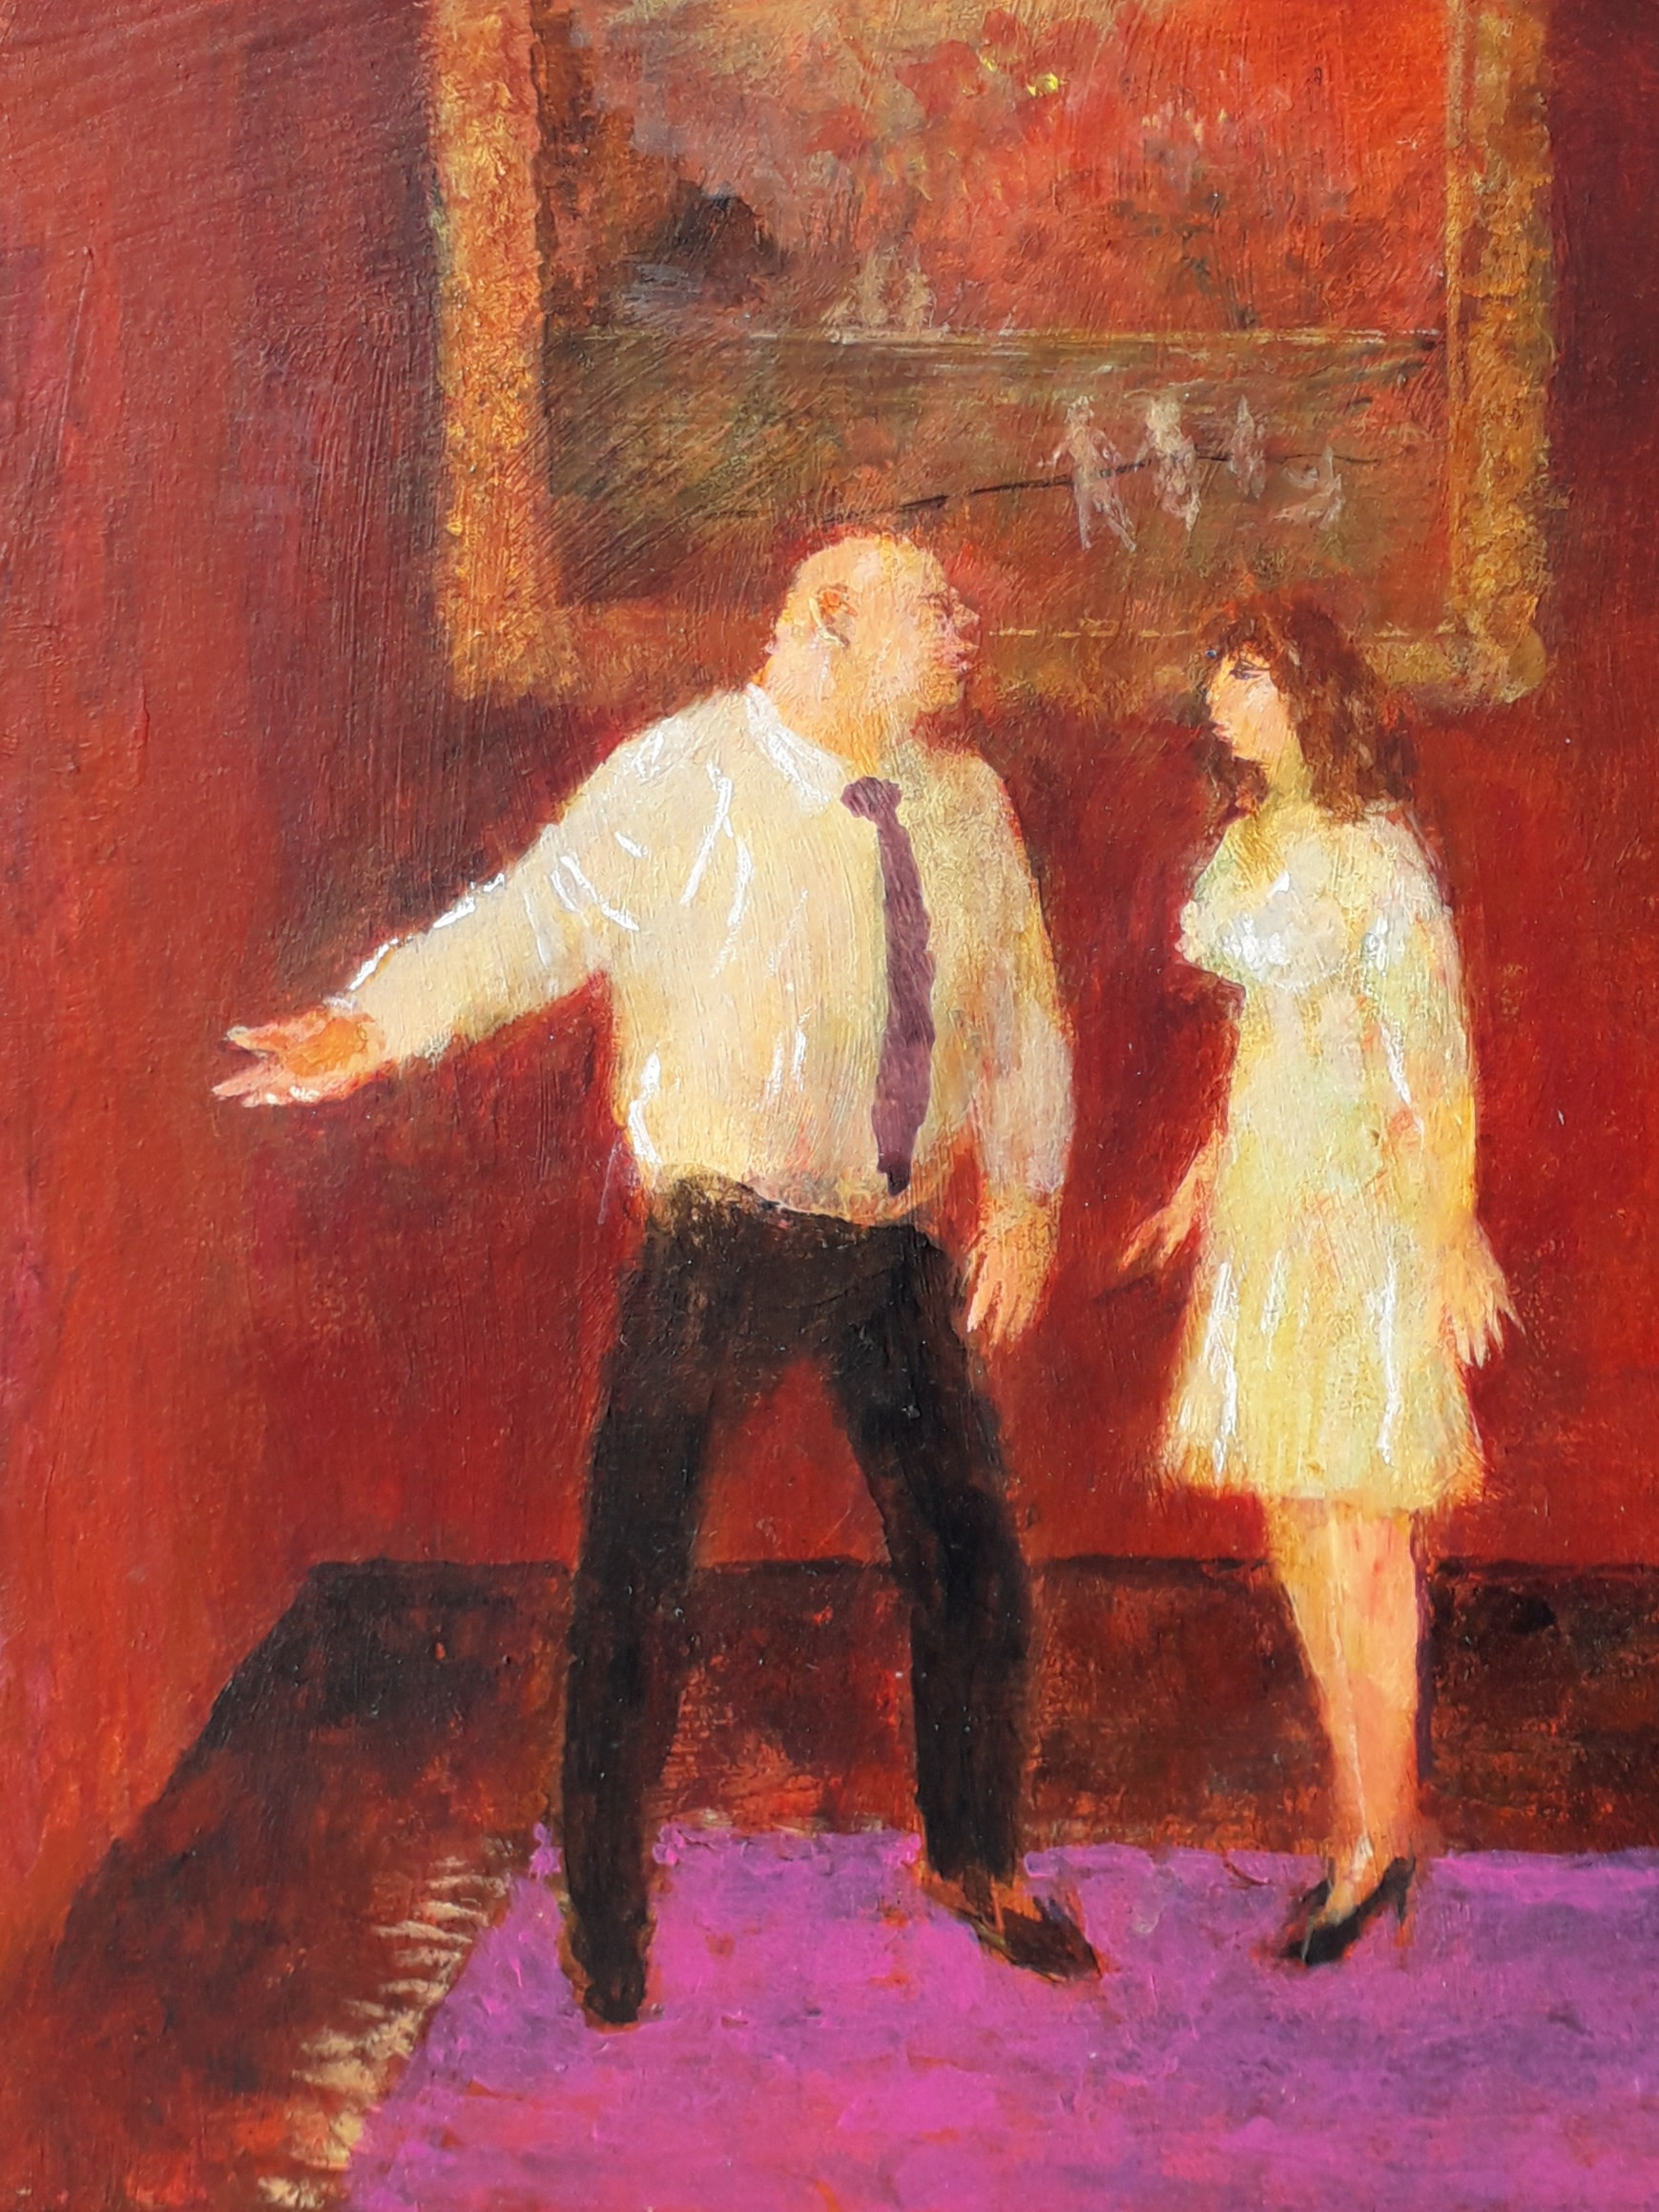 "<span class=""link fancybox-details-link""><a href=""/artists/103-richard-sorrell/works/12611-richard-sorrell-old-master/"">View Detail Page</a></span><div class=""artist""><span class=""artist""><strong>Richard Sorrell</strong></span></div><div class=""title""><em>Old Master</em></div><div class=""medium"">acrylic</div><div class=""dimensions"">Artwork: 19 x 23cm</div><div class=""price"">£585.00</div>"